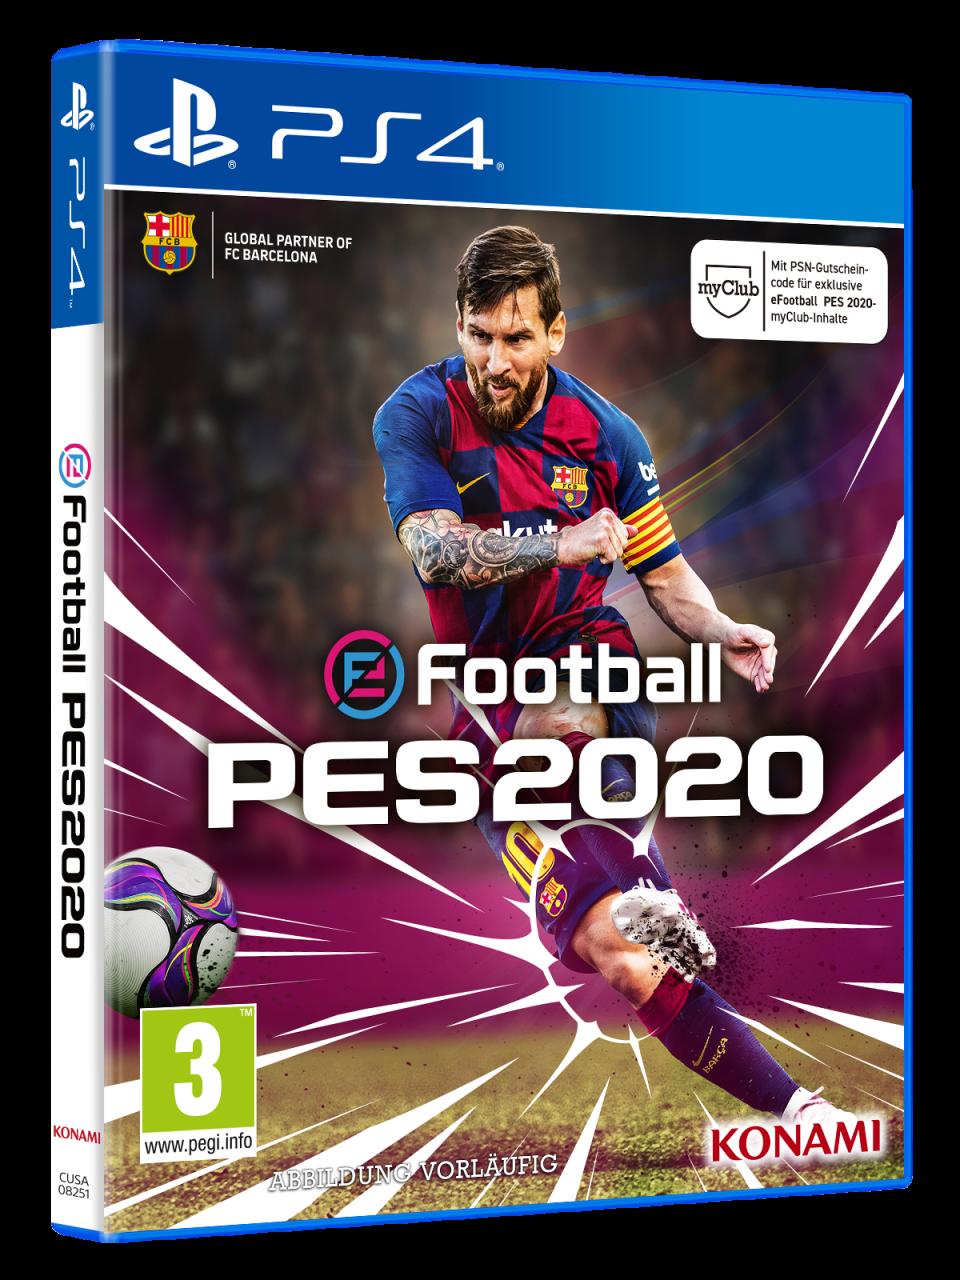 #E32019 Nuestra impresión de Pro Evolution Soccer 2020 1